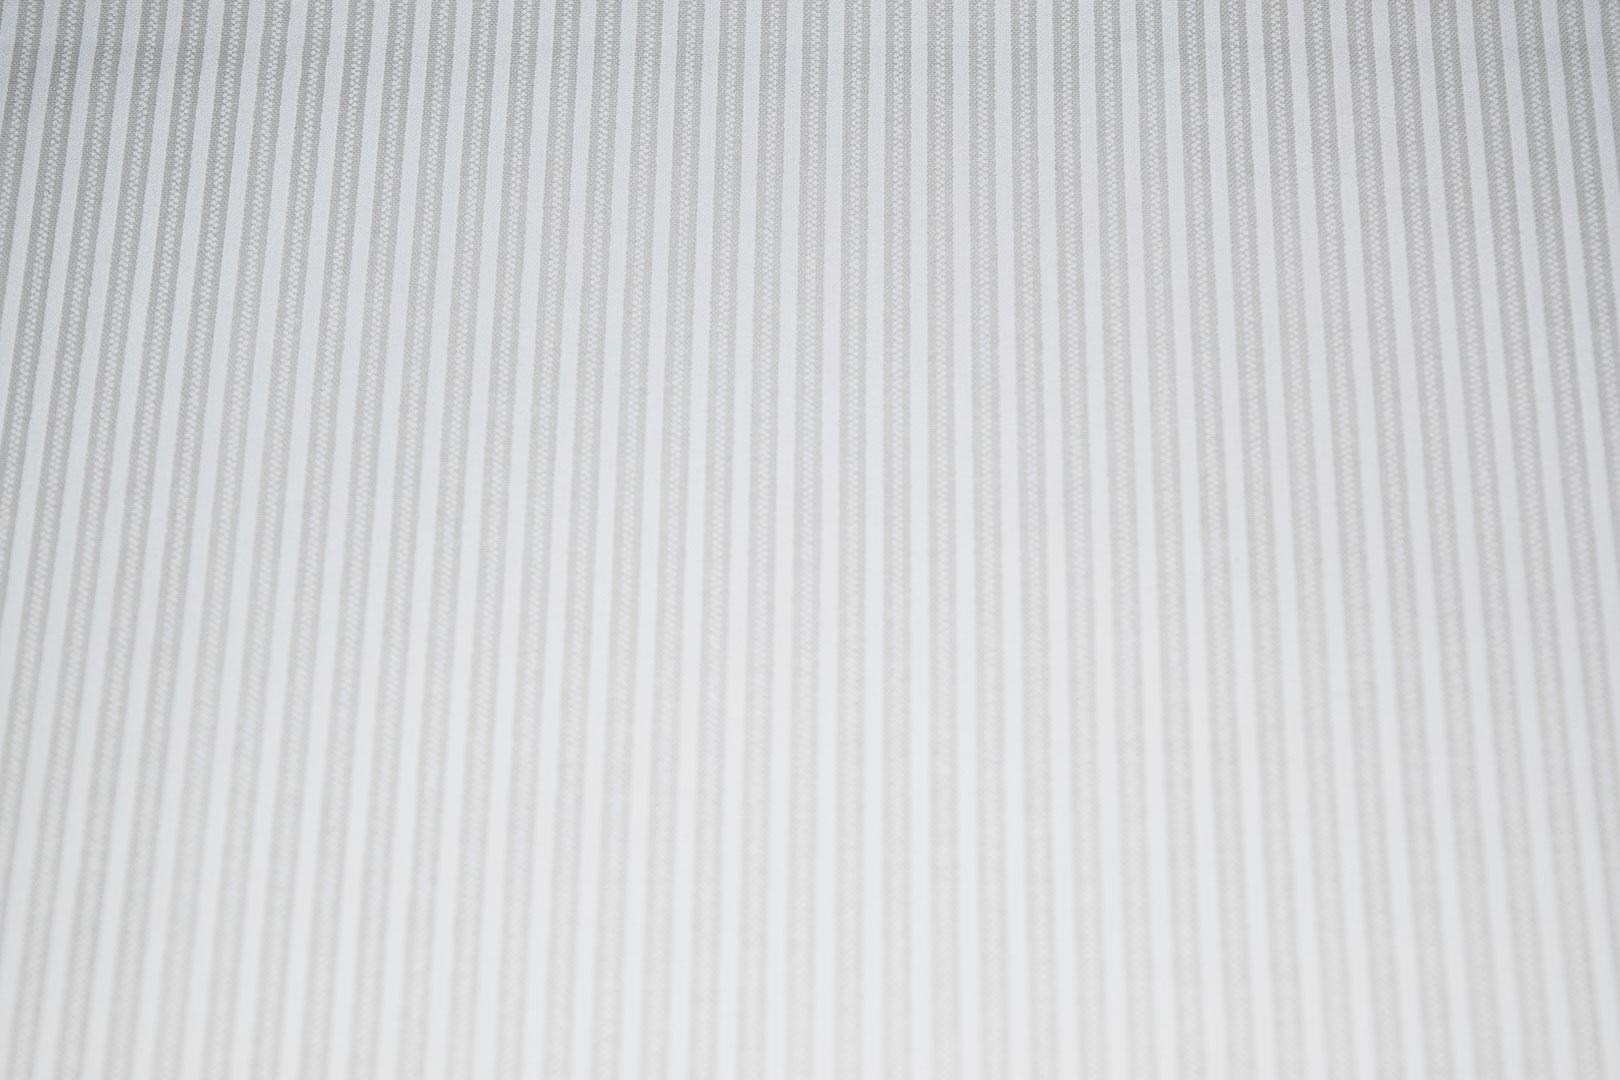 "8_29888_ww   44/45"" 68/68, 100% Carded Cotton"